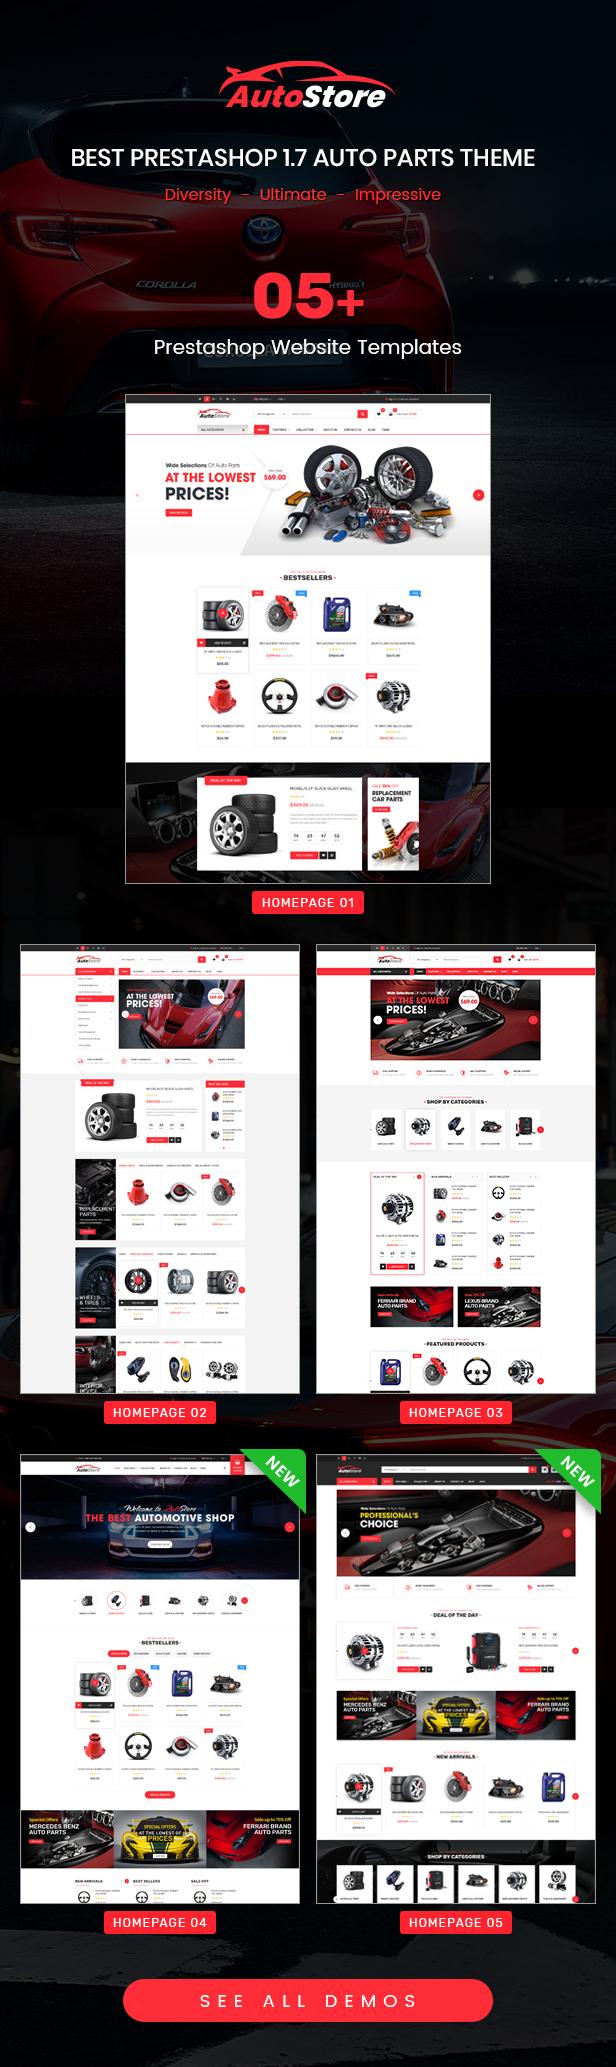 AutoStore - Responsive PrestaShop 1.7 Autopart Theme - 1